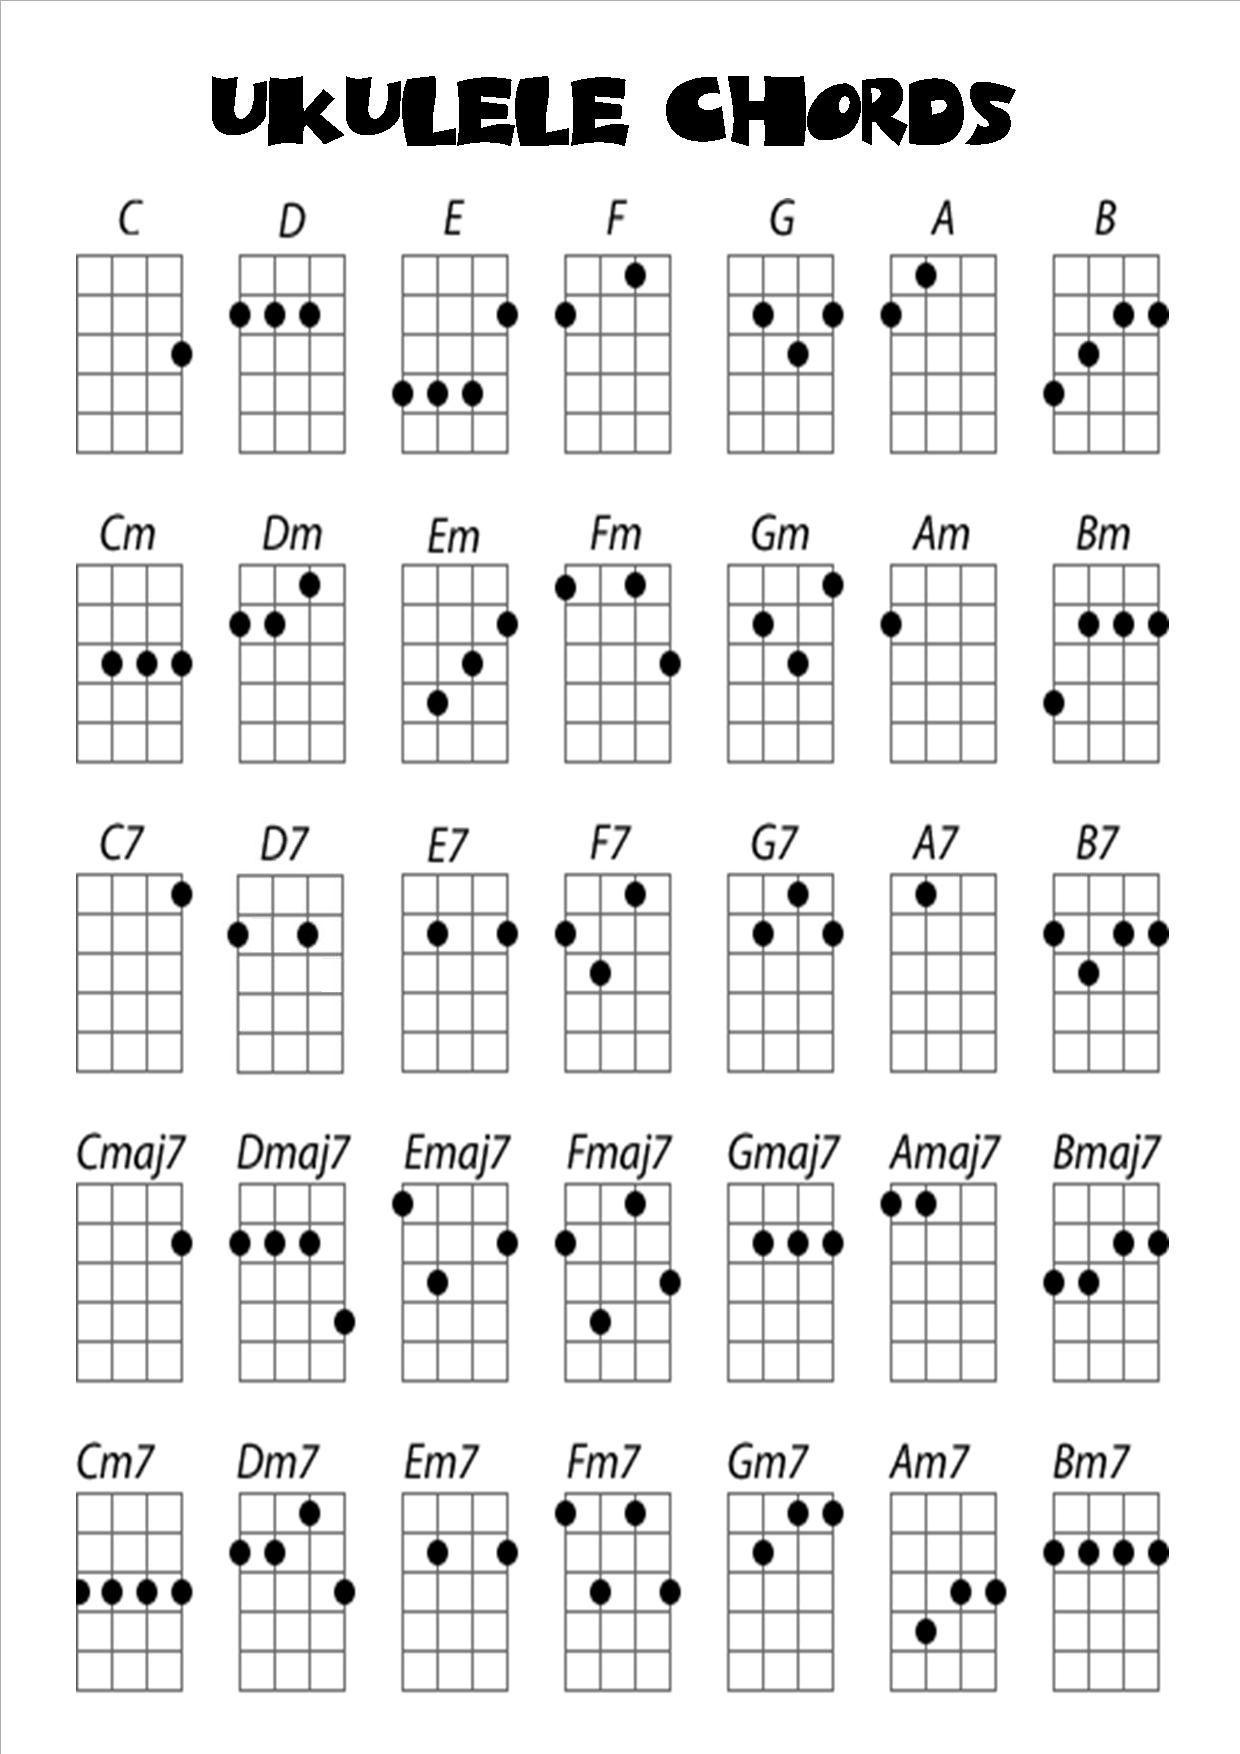 Ukulelechordsg 12401754 small and fierce pinterest learn to play ukulele learn how to play the basic ukulele chords for beginners hexwebz Images